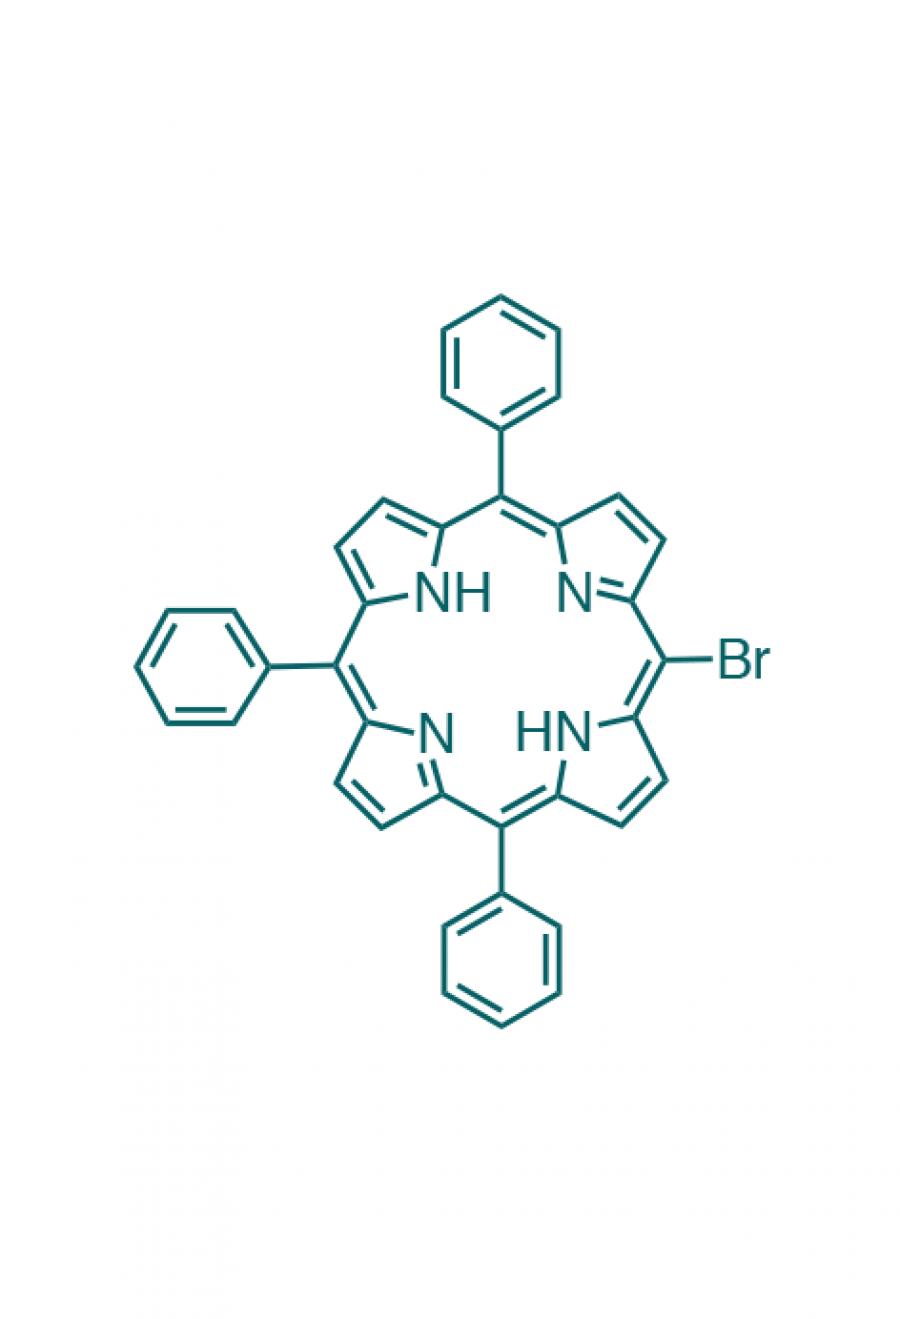 5-(bromo)-10,15,20-(triphenyl)porphyrin